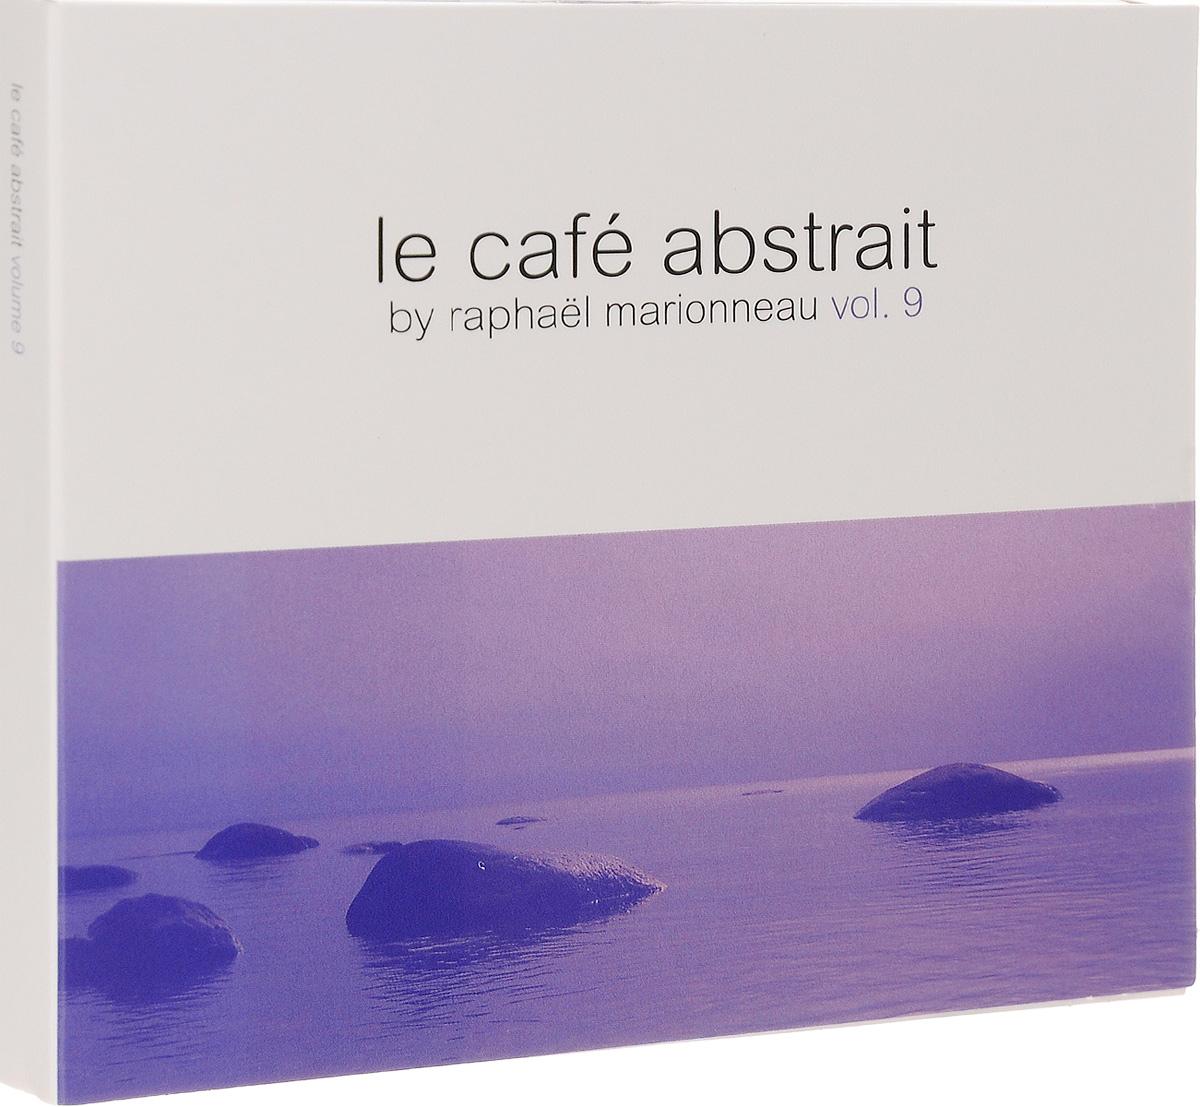 Sambox,Raphael Marionneau Le Cafe Abstrait Volume 9 (2 CD)